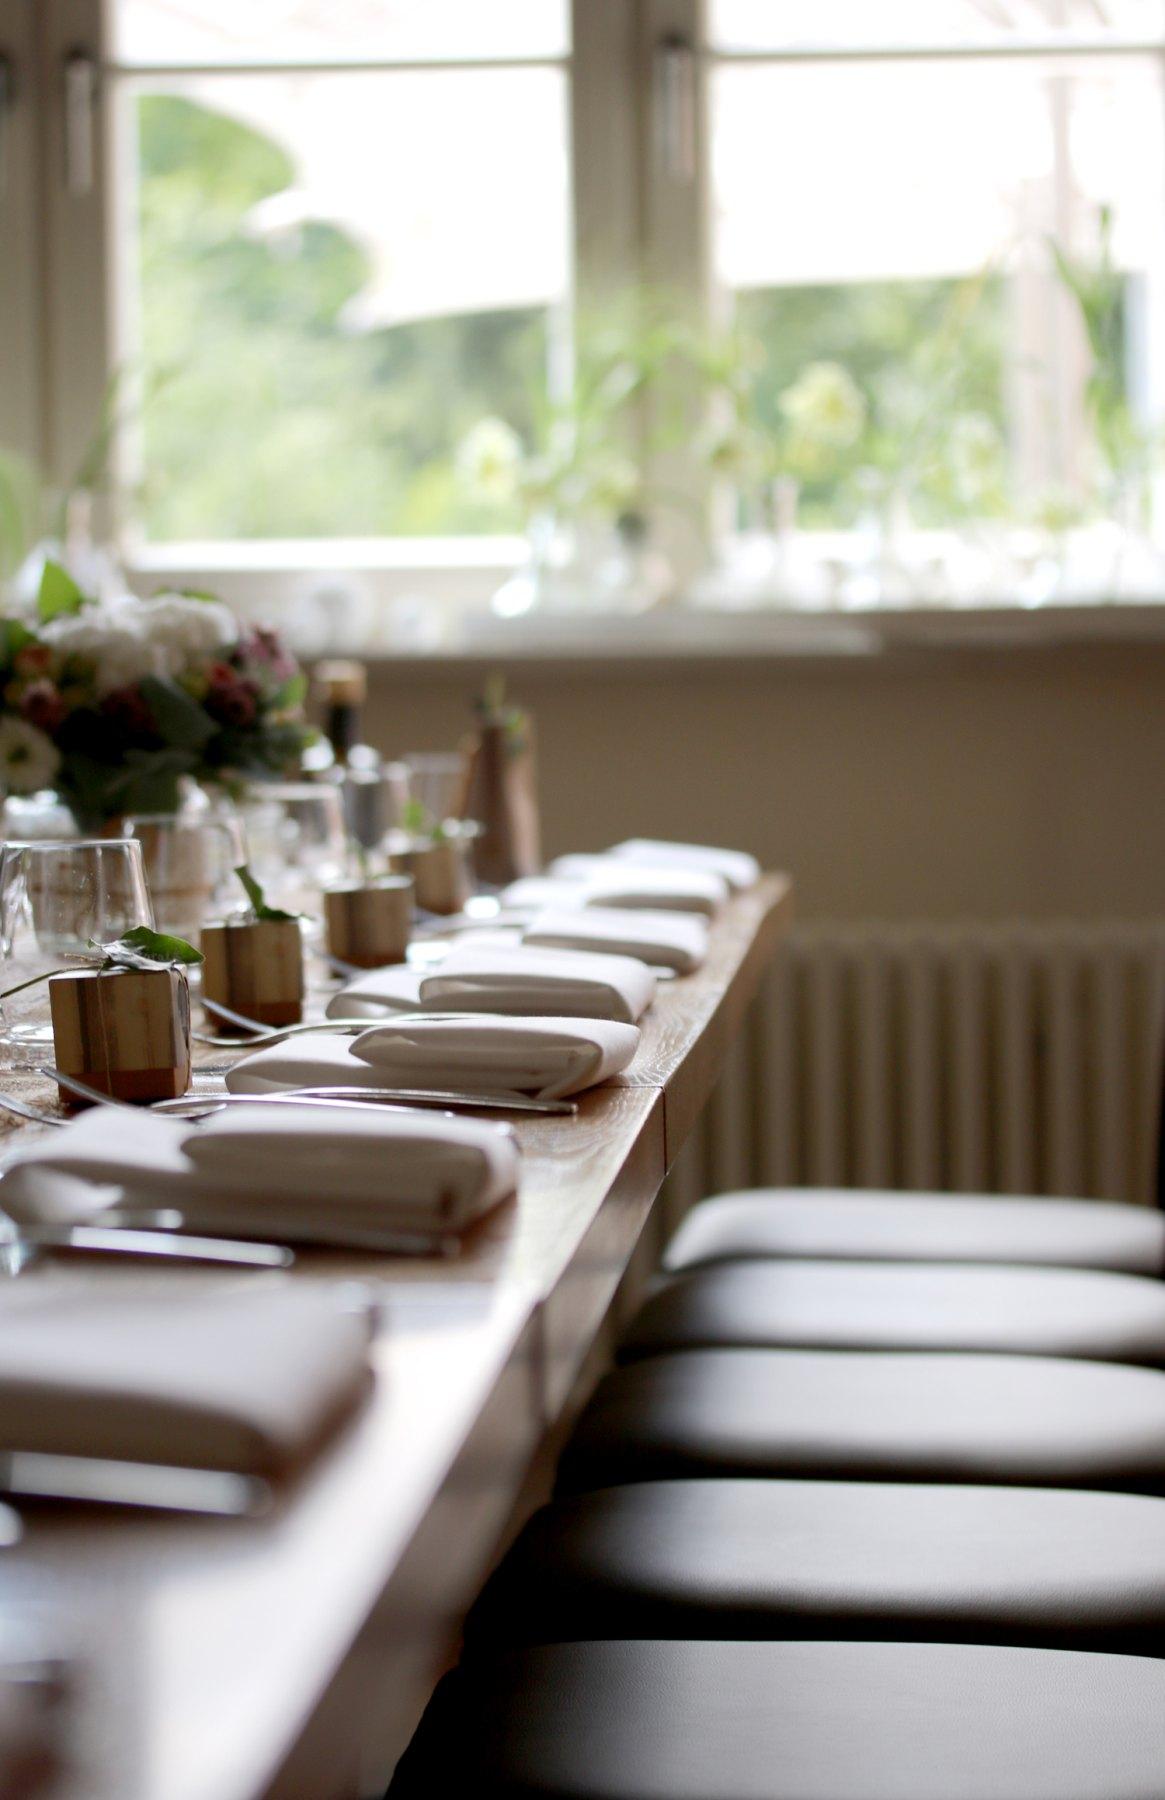 restaurant-heimart-gastronomie-feier-catering-salzwedel-1436